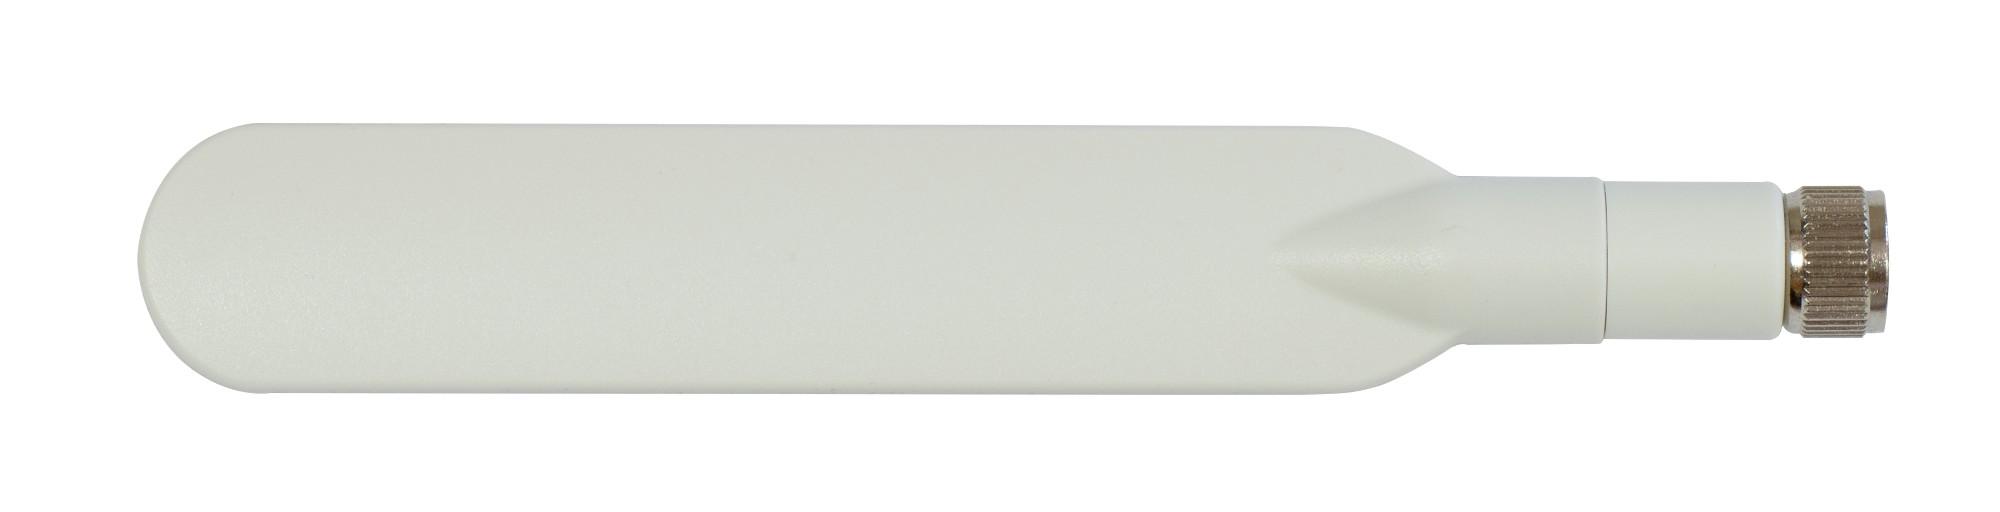 Mikrotik 2.4Ghz Dipole network antenna 5 dBi Directional antenna RP-SMA